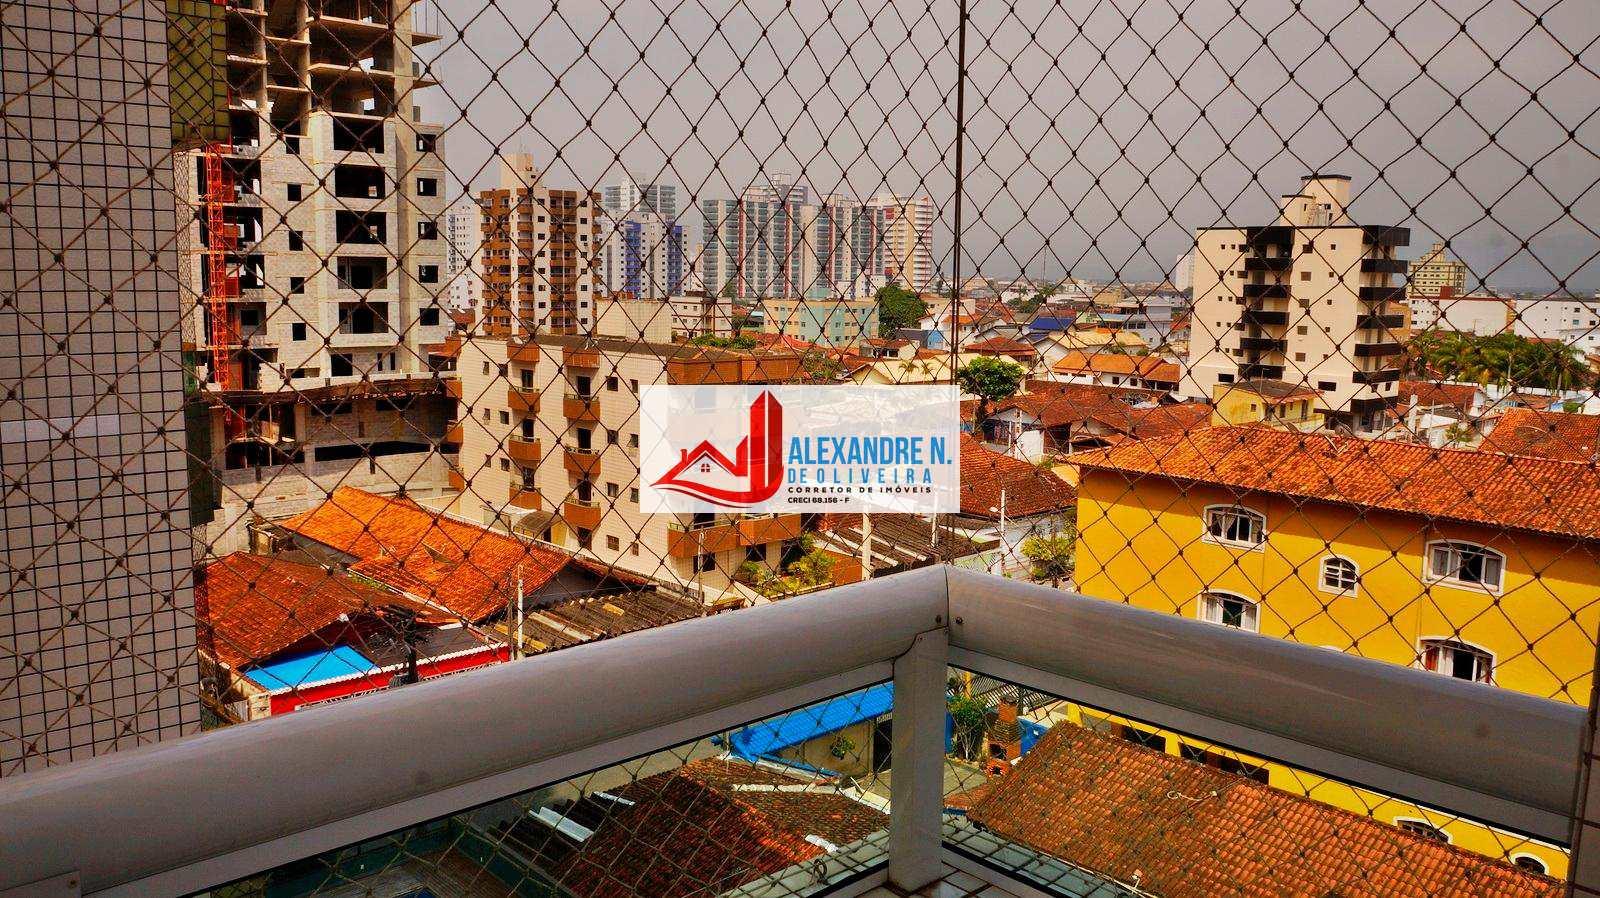 Apto 1 dorm, sacada gourmet, Praia Grande - R$ 195 mil, AP00300